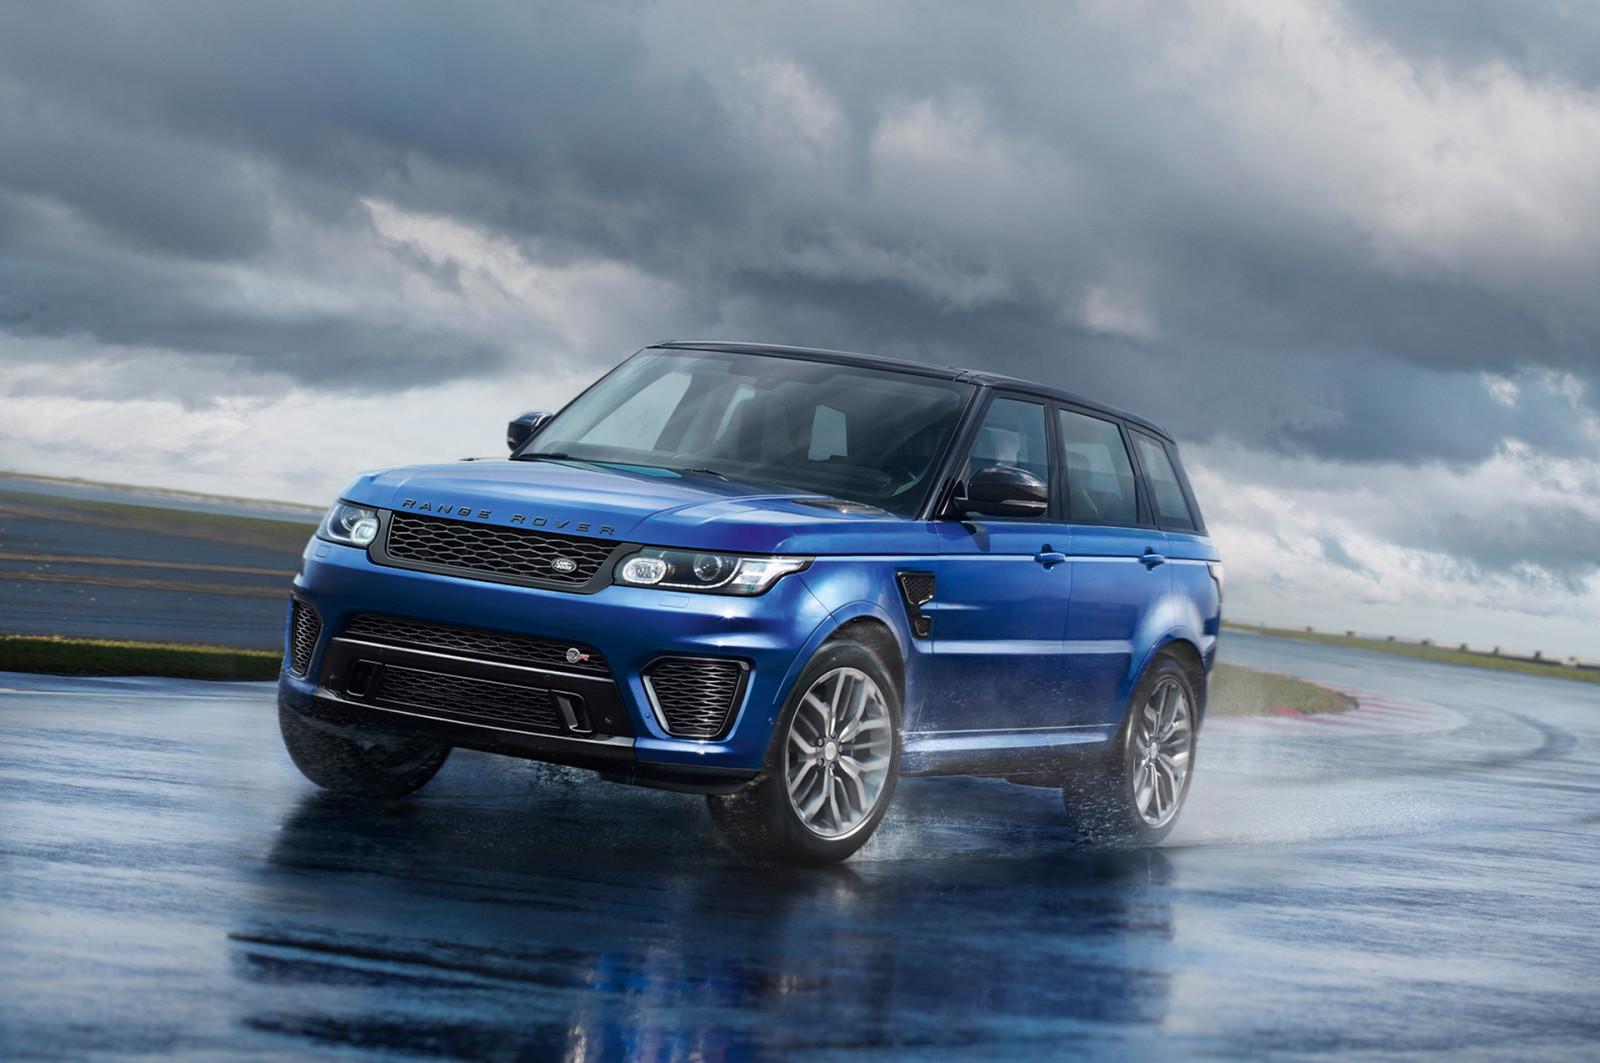 2015-Land-Rover-Range-Rover-Sport-SVR-promo-e1465328457800